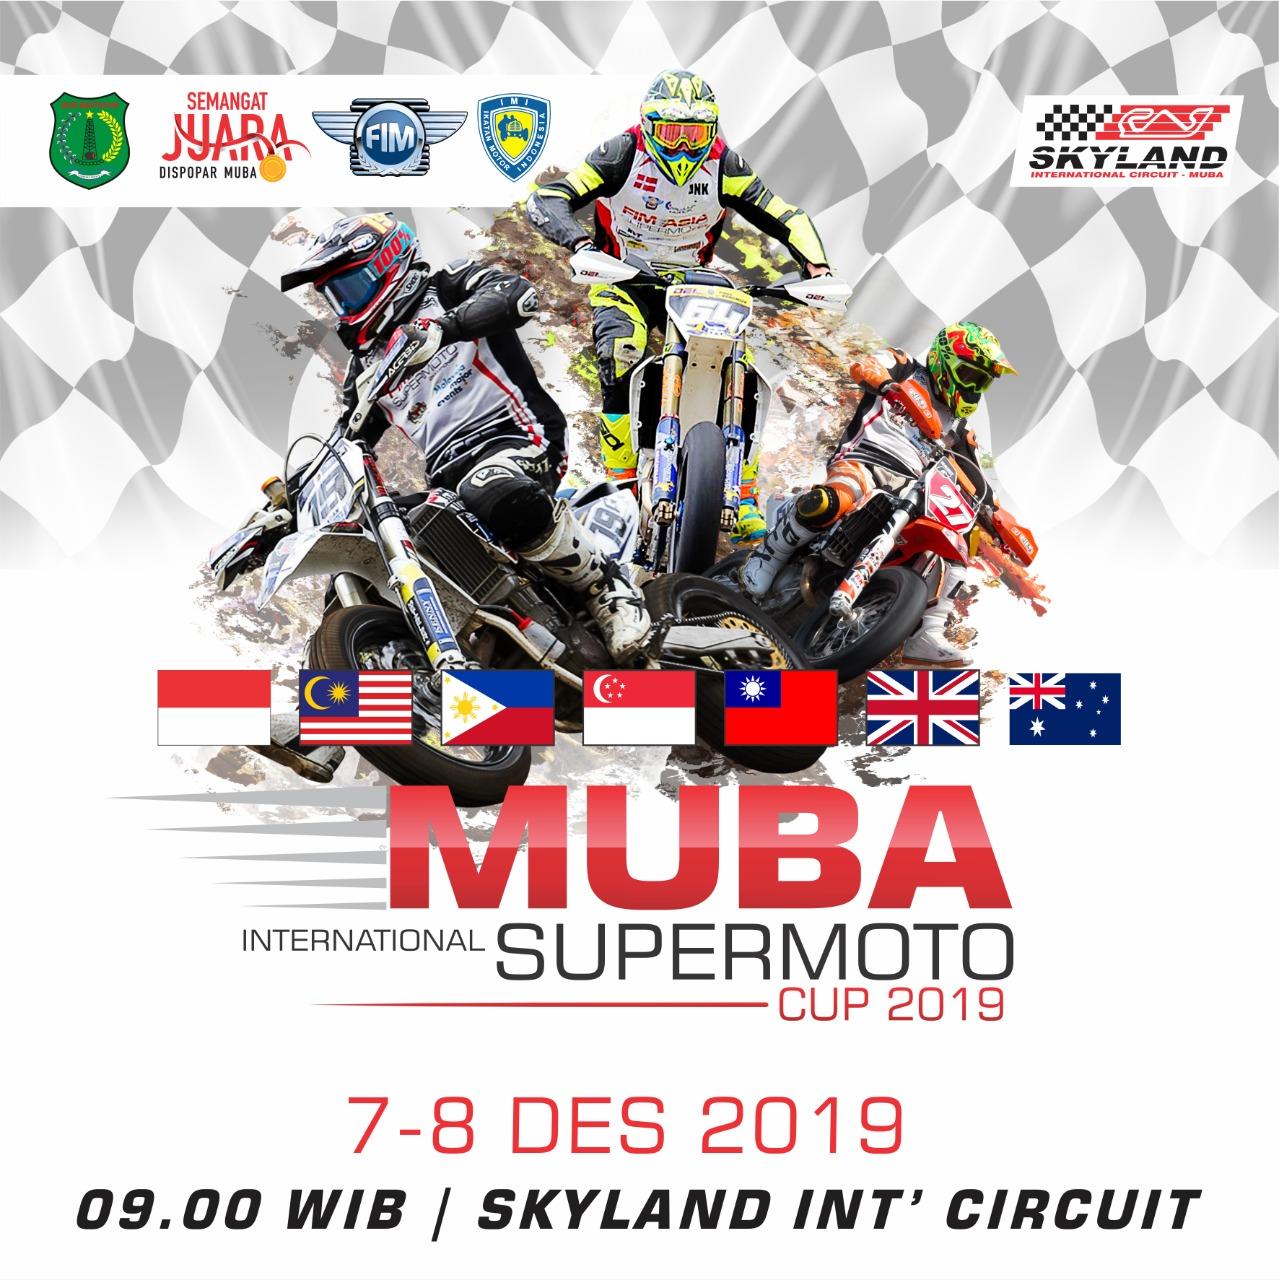 muba-internasional-supermoto-cup-2019-doni-tata-bakal-geber-skyland-internasional-circuit-muba-muba507h1575365969.jpg